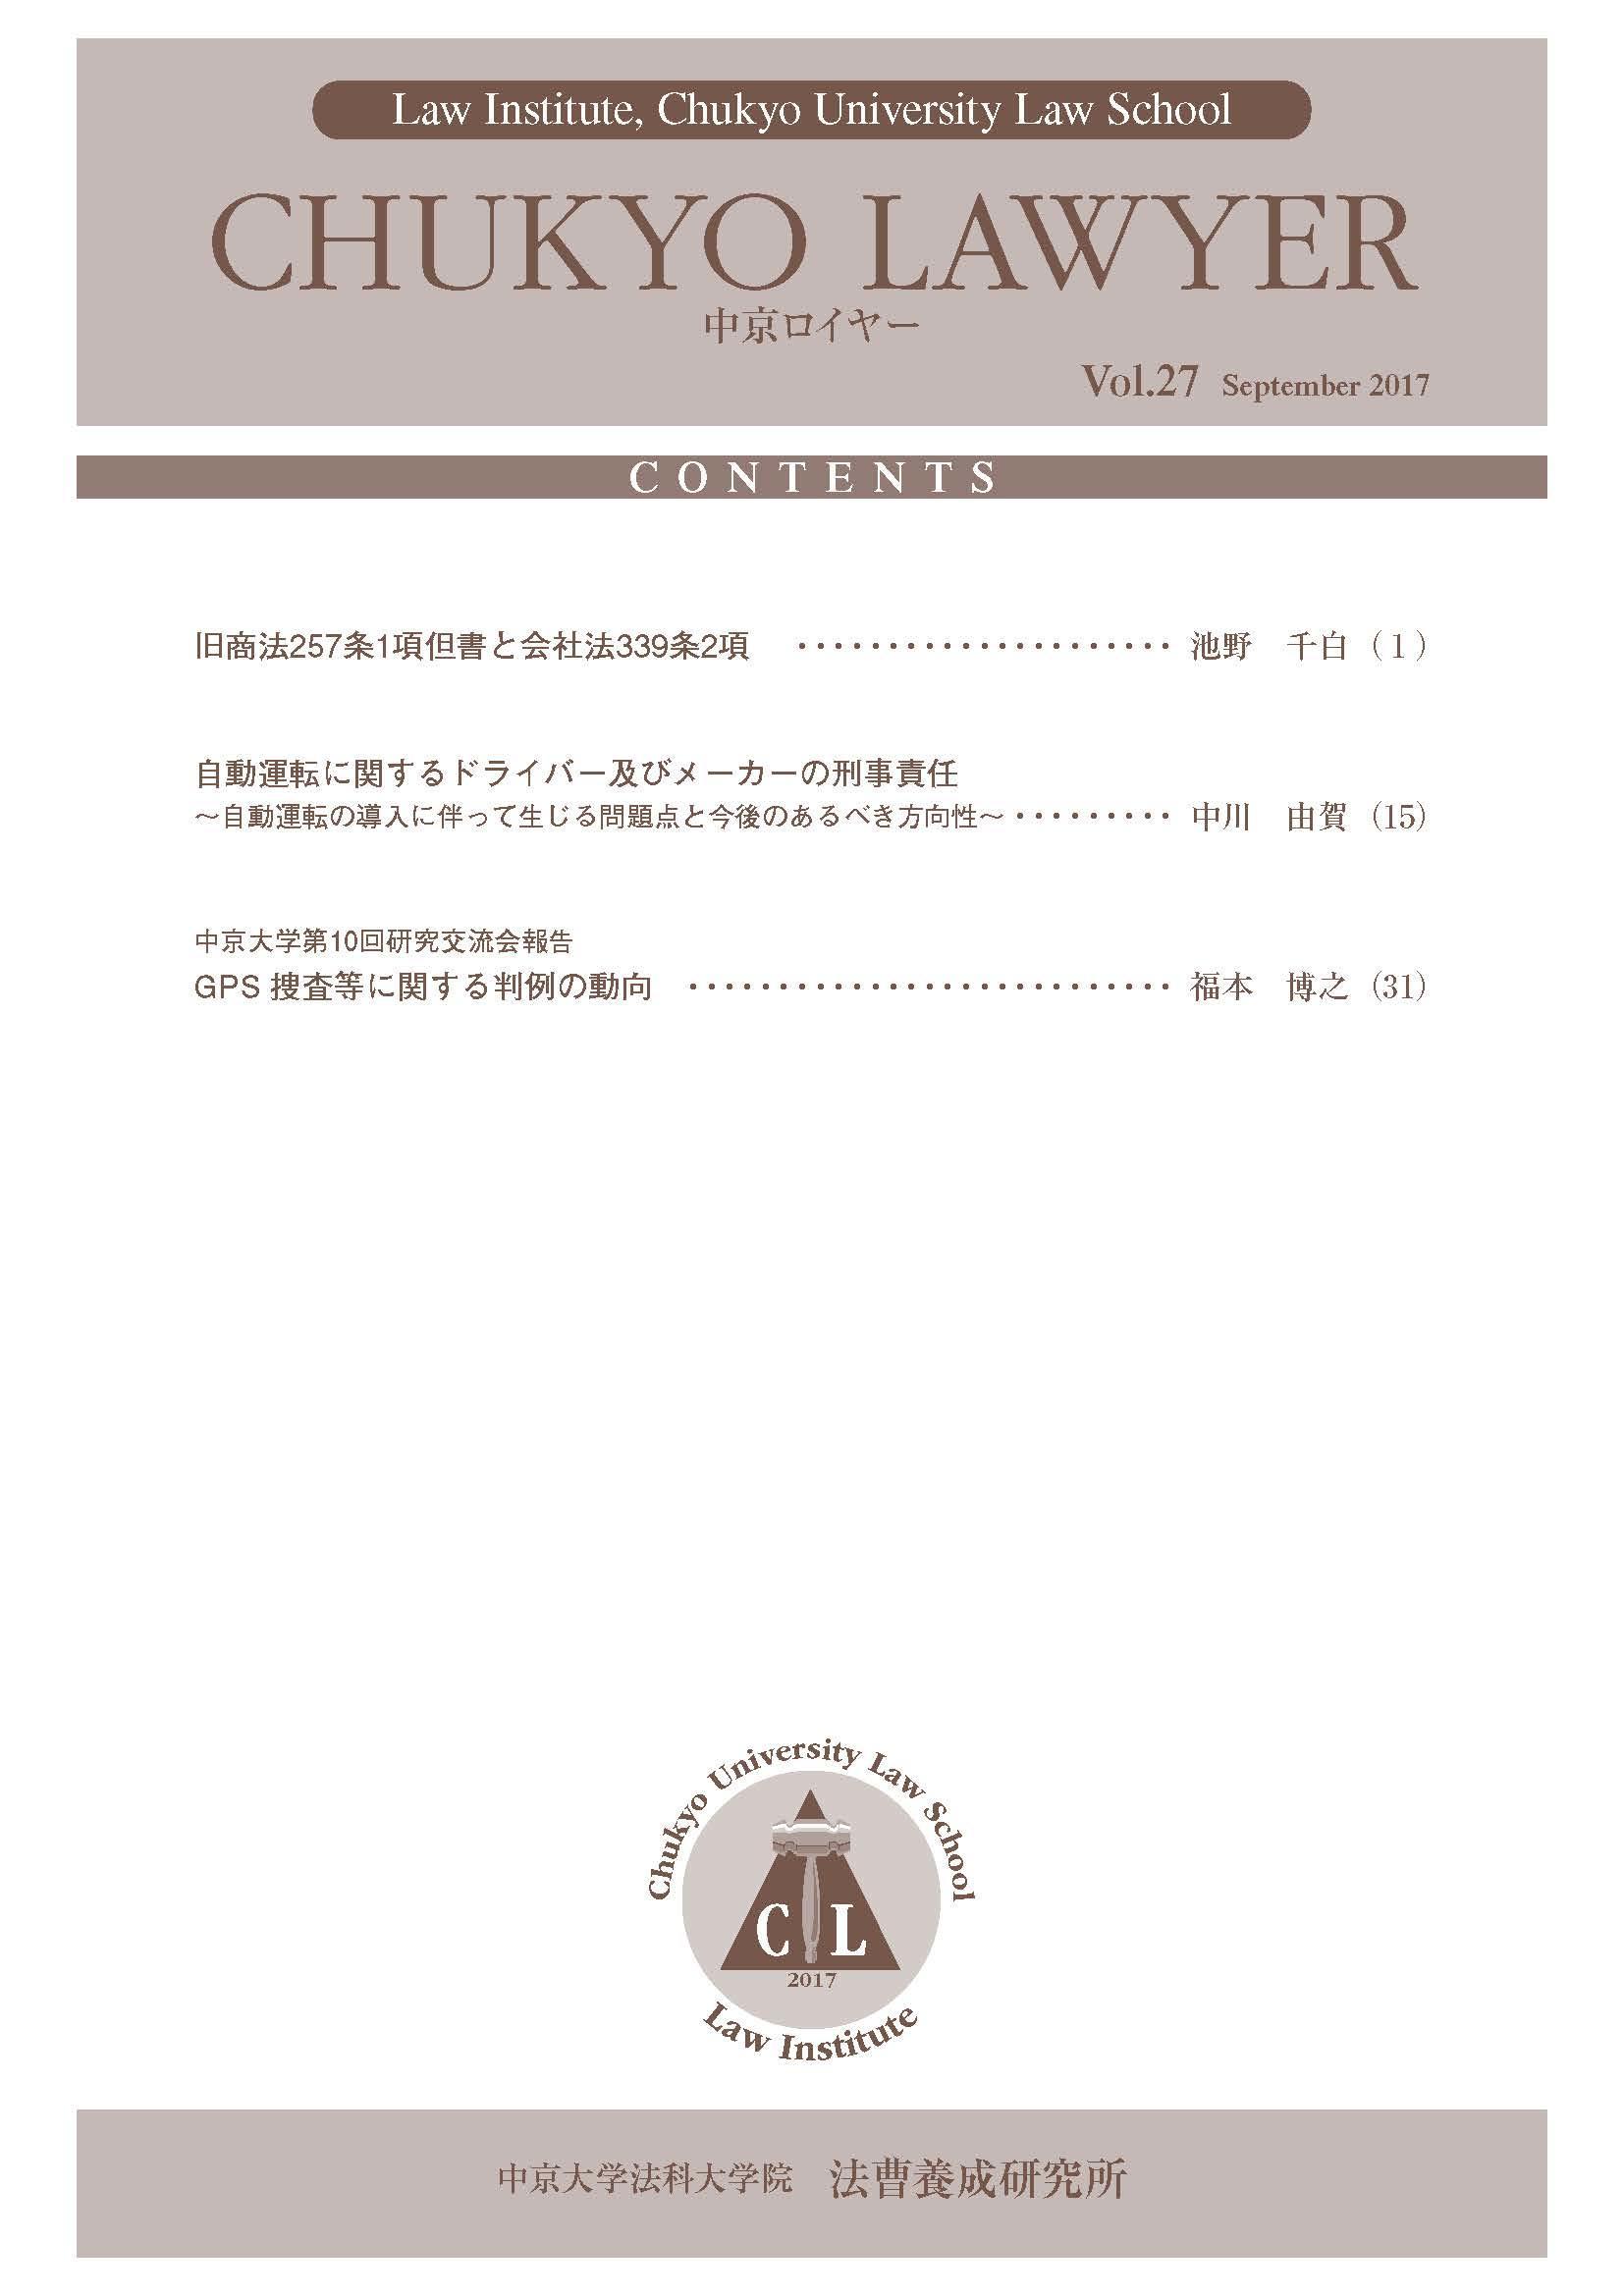 CHUKYO LAWYER Vol.27